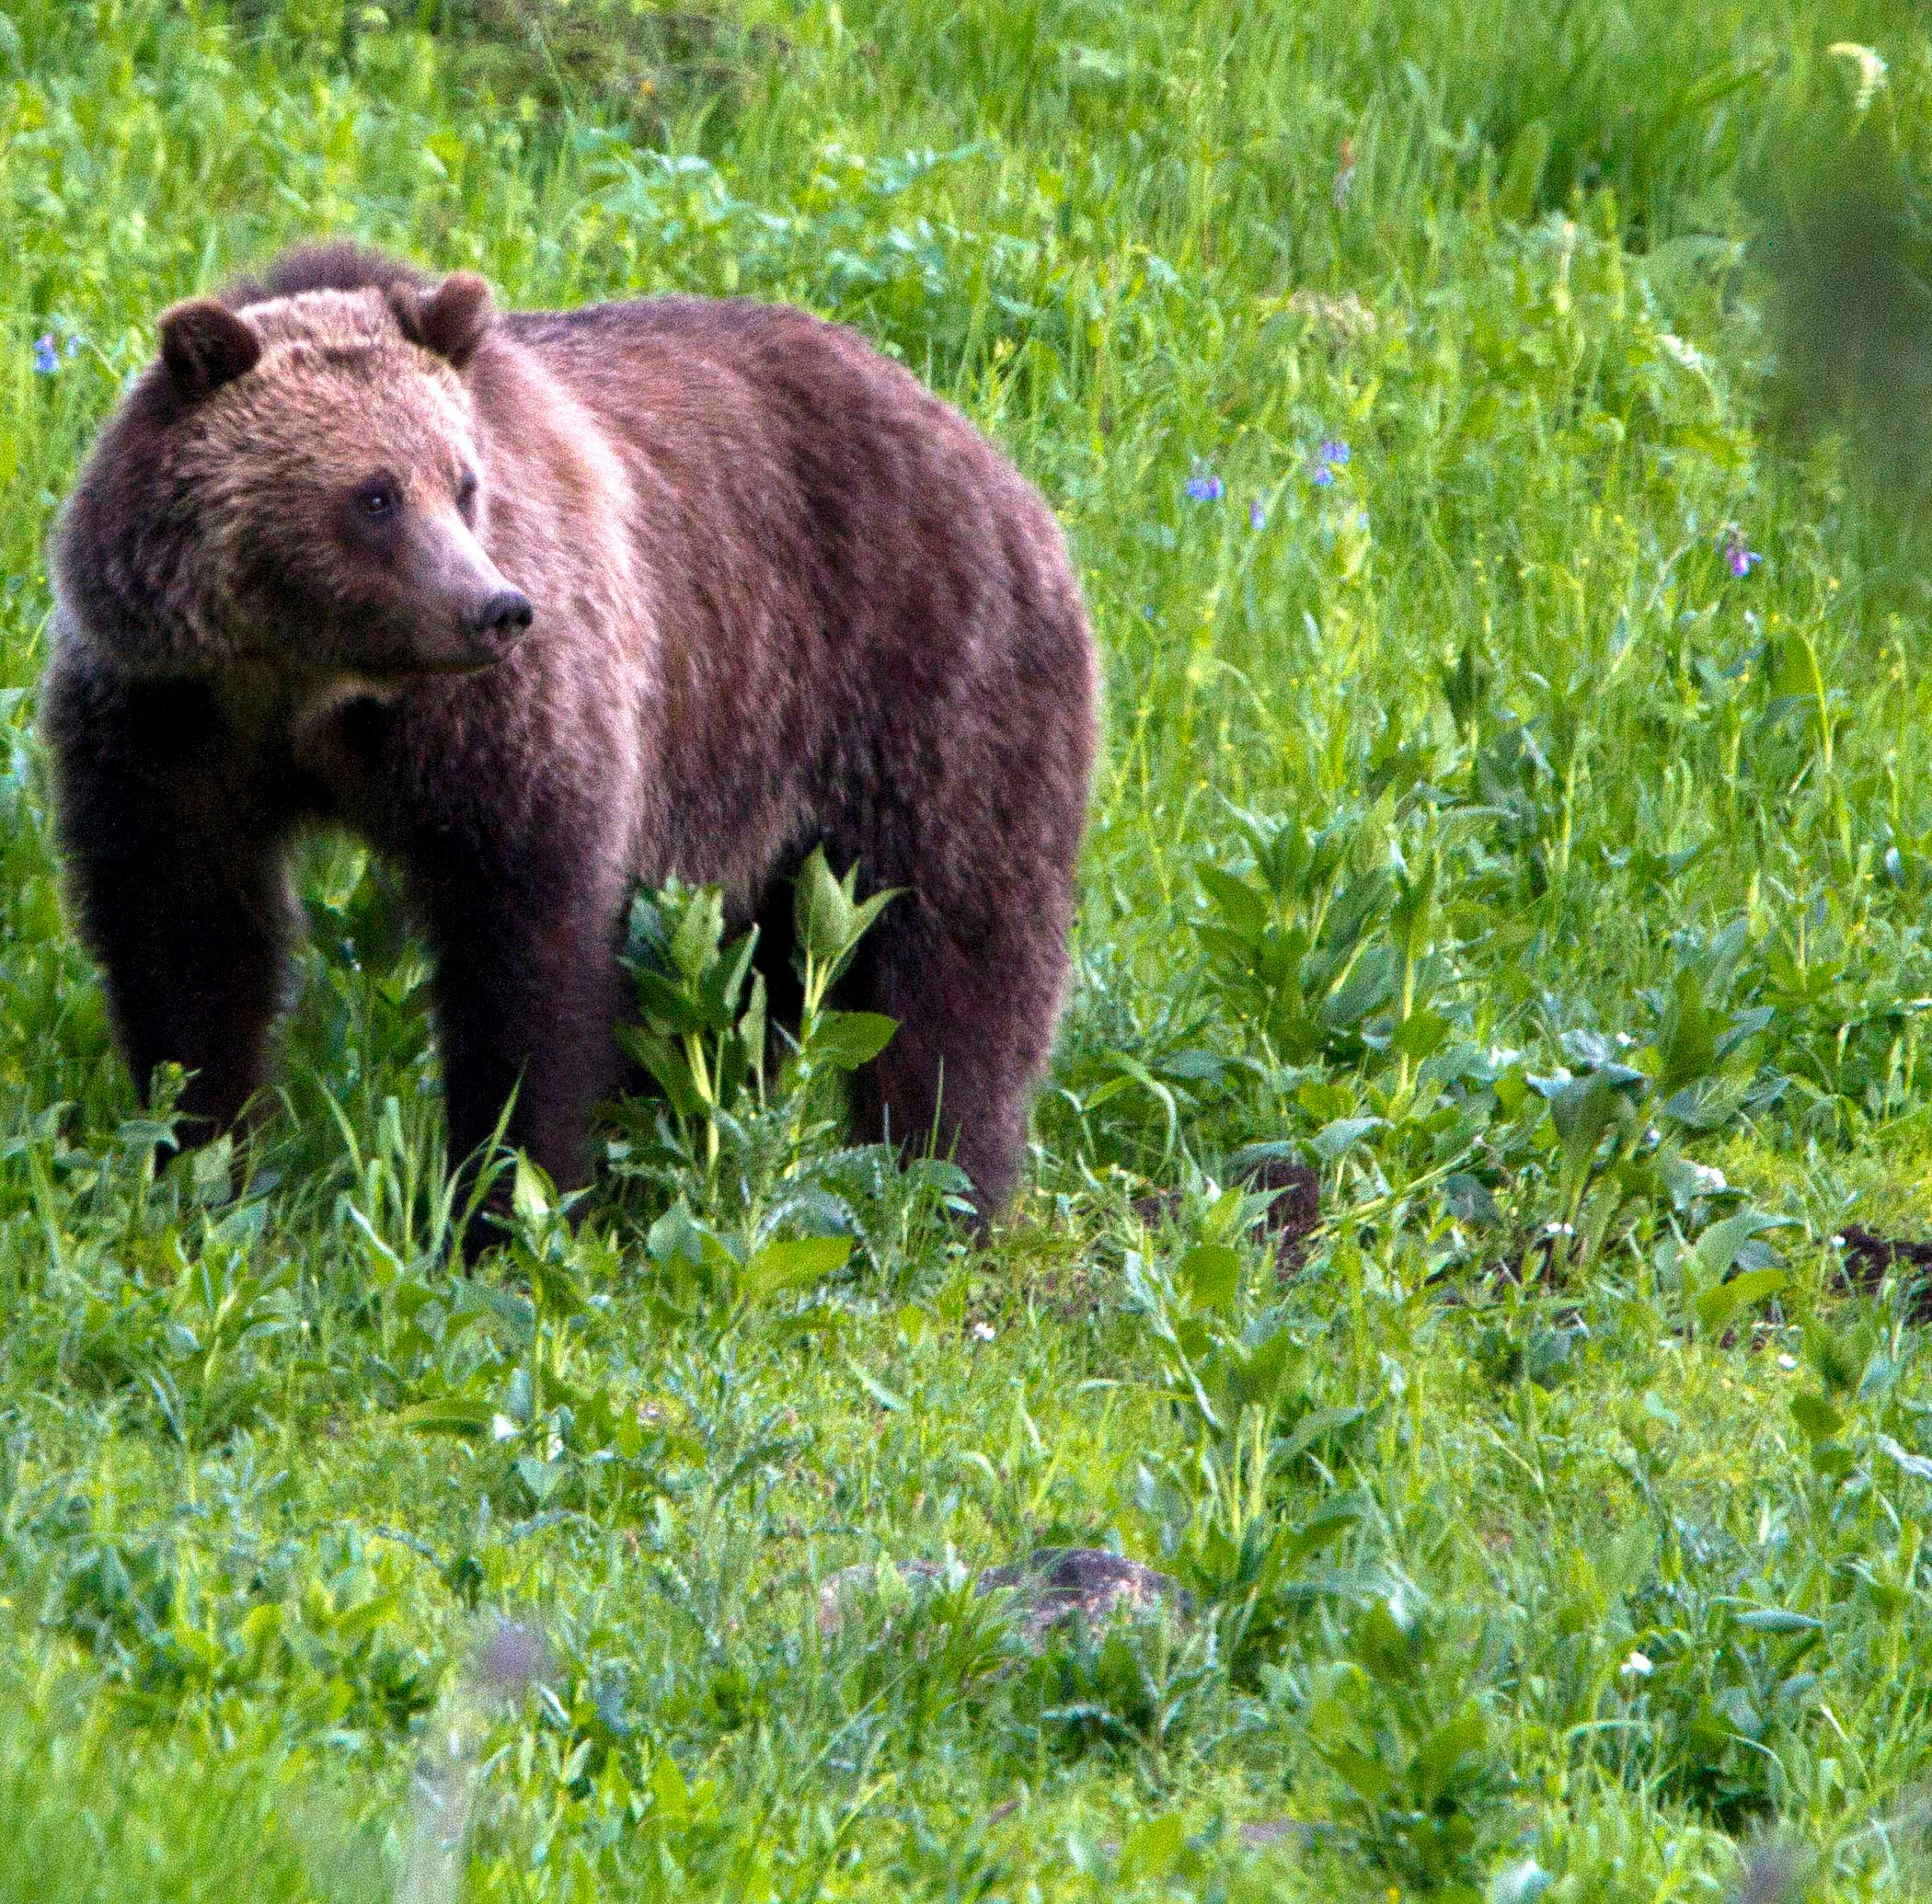 Elk hunter recovering after bear attack, suffered broken arm